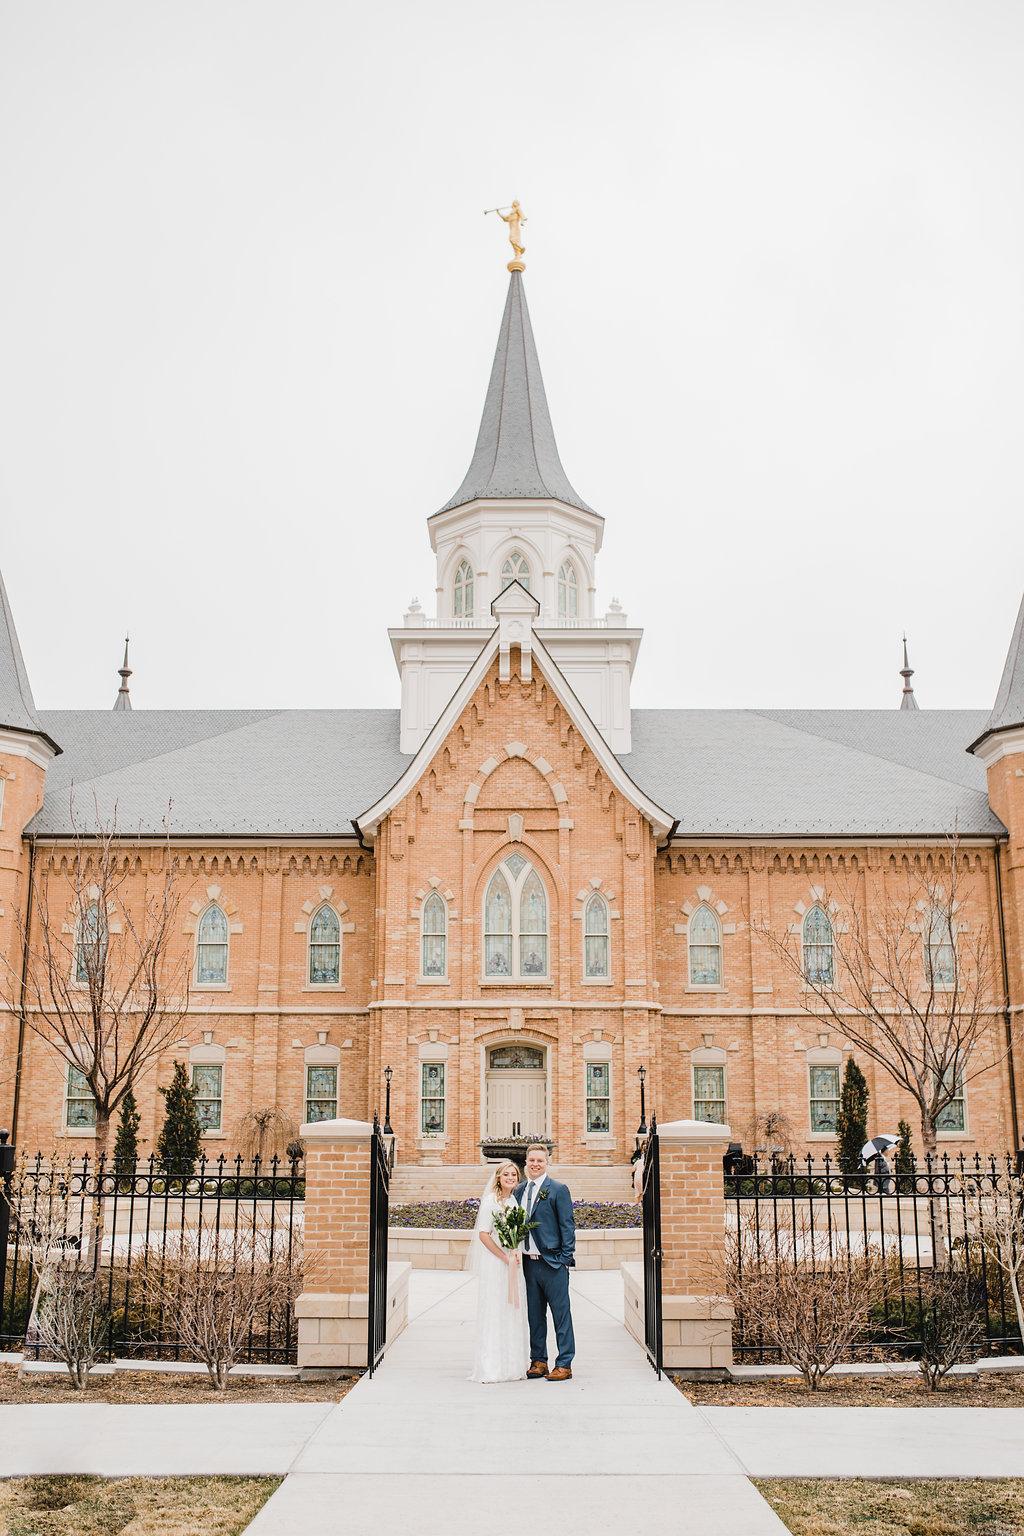 provo city center temple wedding photos lds